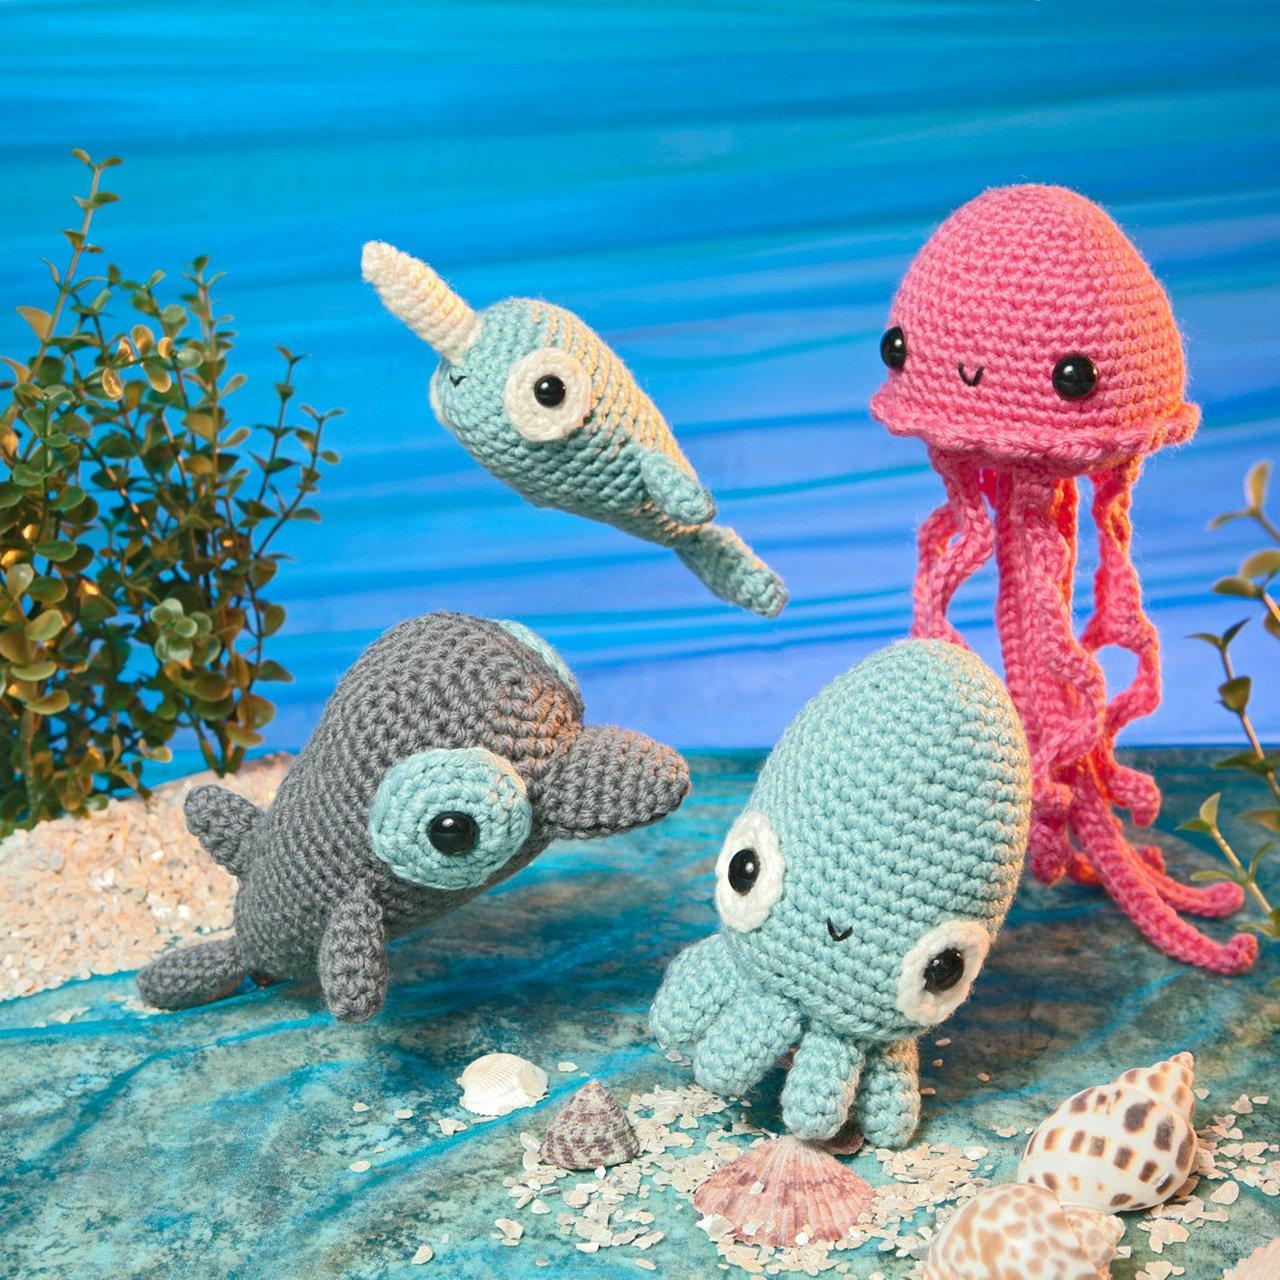 Crochet Subscription Box | Keep Calm and Crochet On U.K | 1280x1280